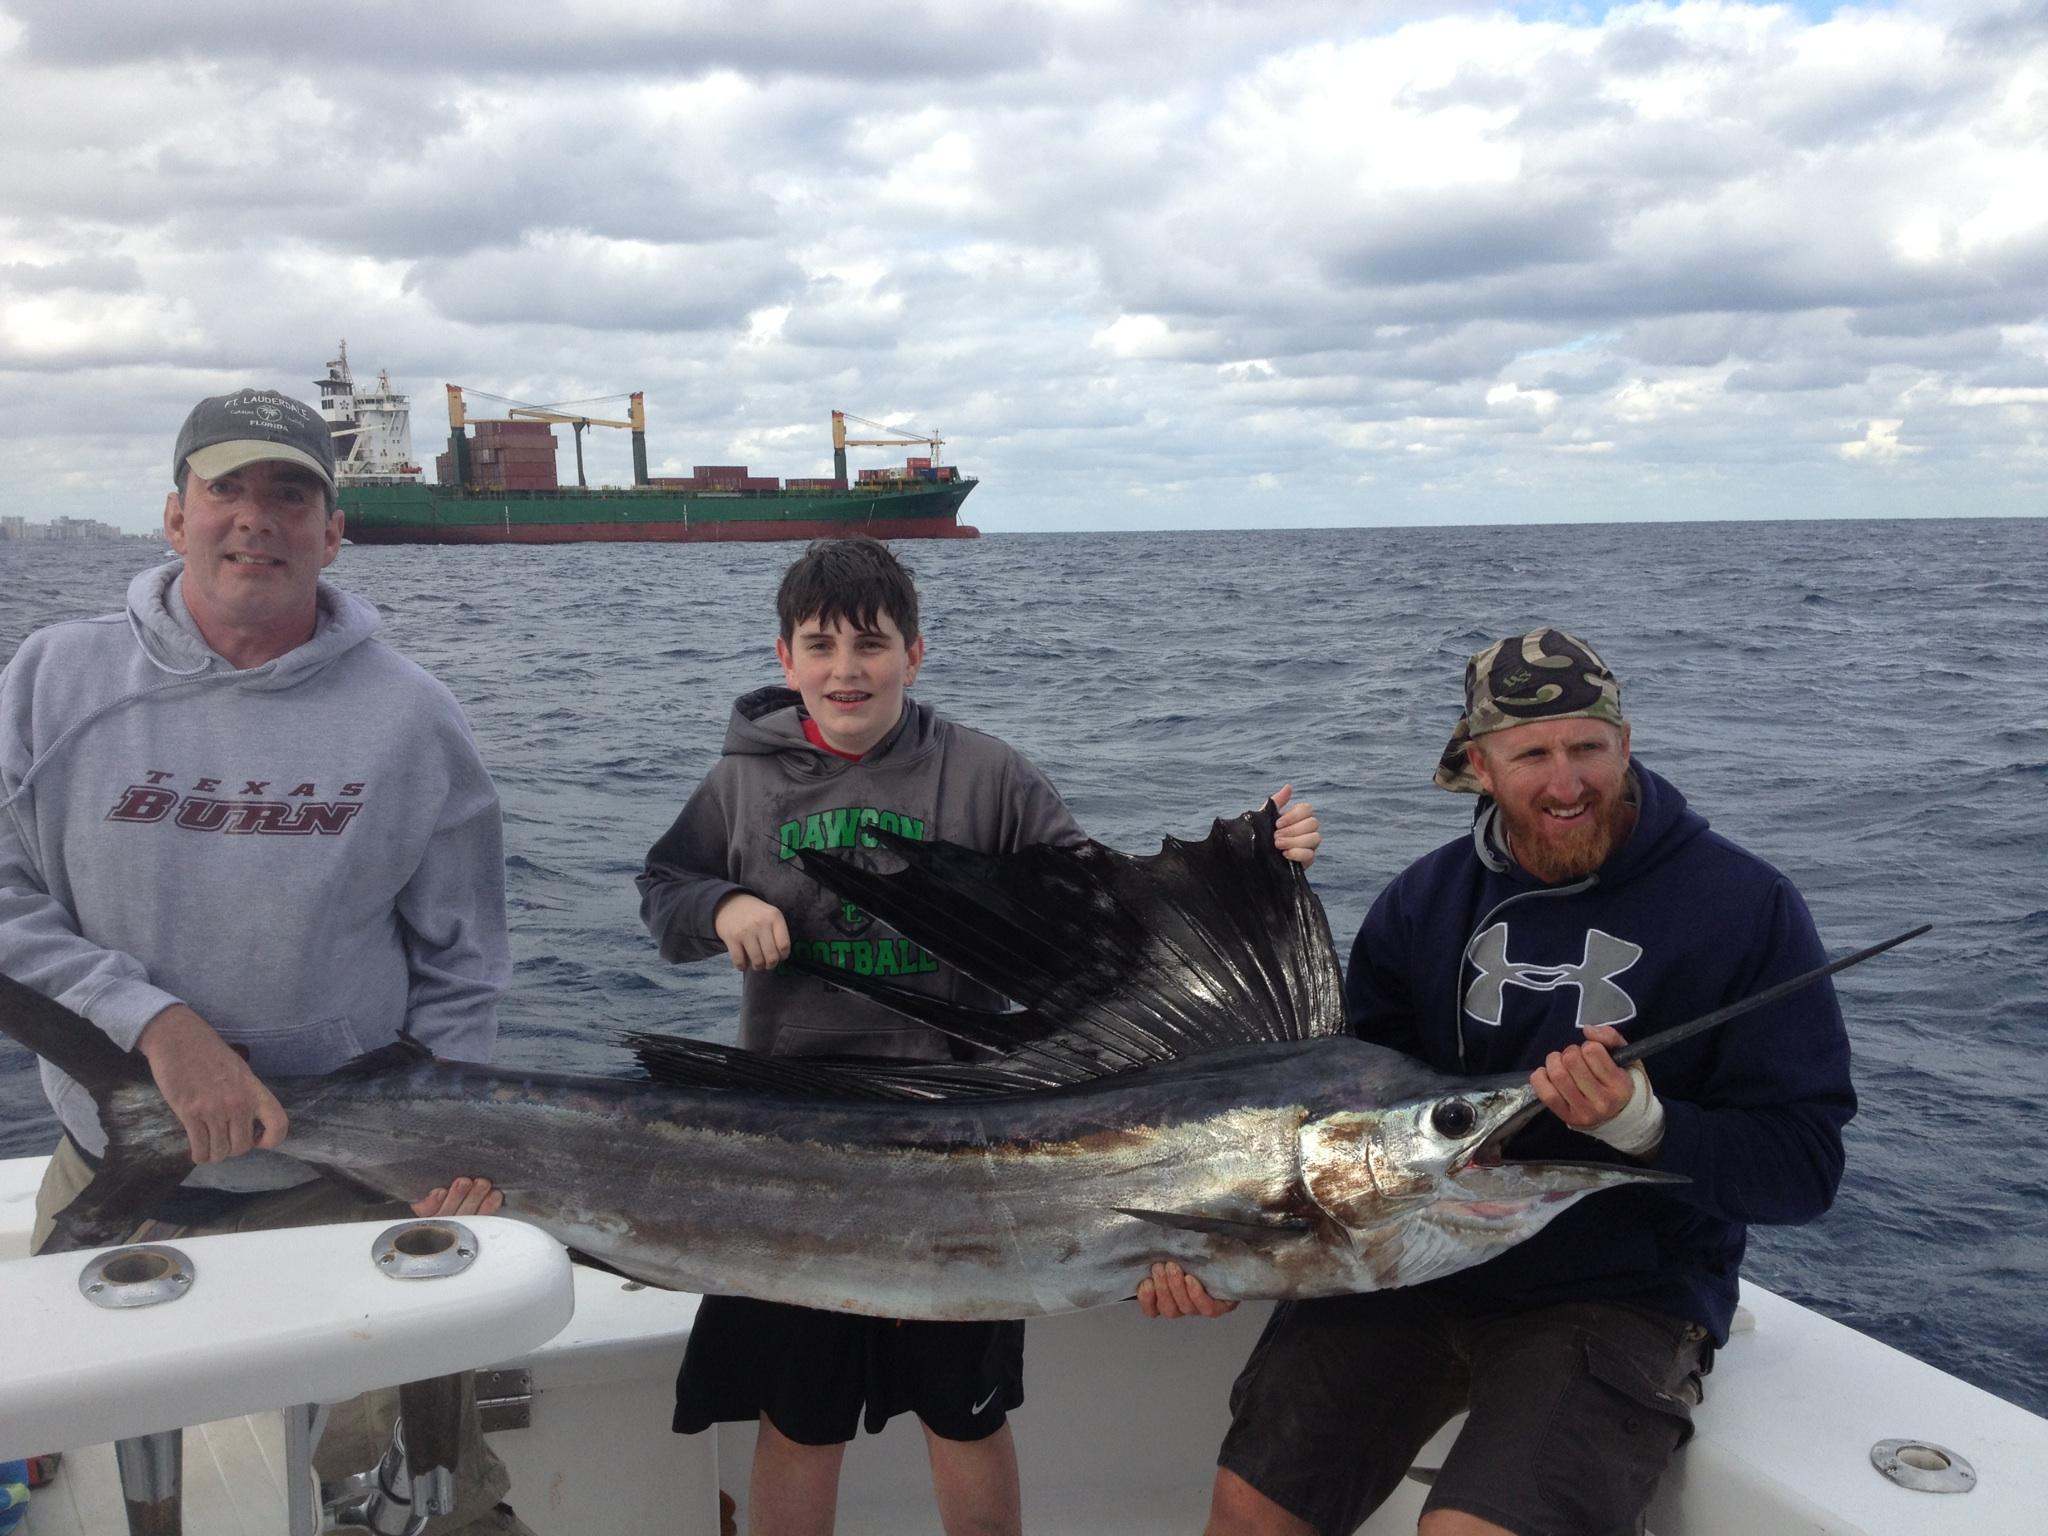 Fort lauderdale fishing reports new lattitude sportfishing for Ft lauderdale fishing report